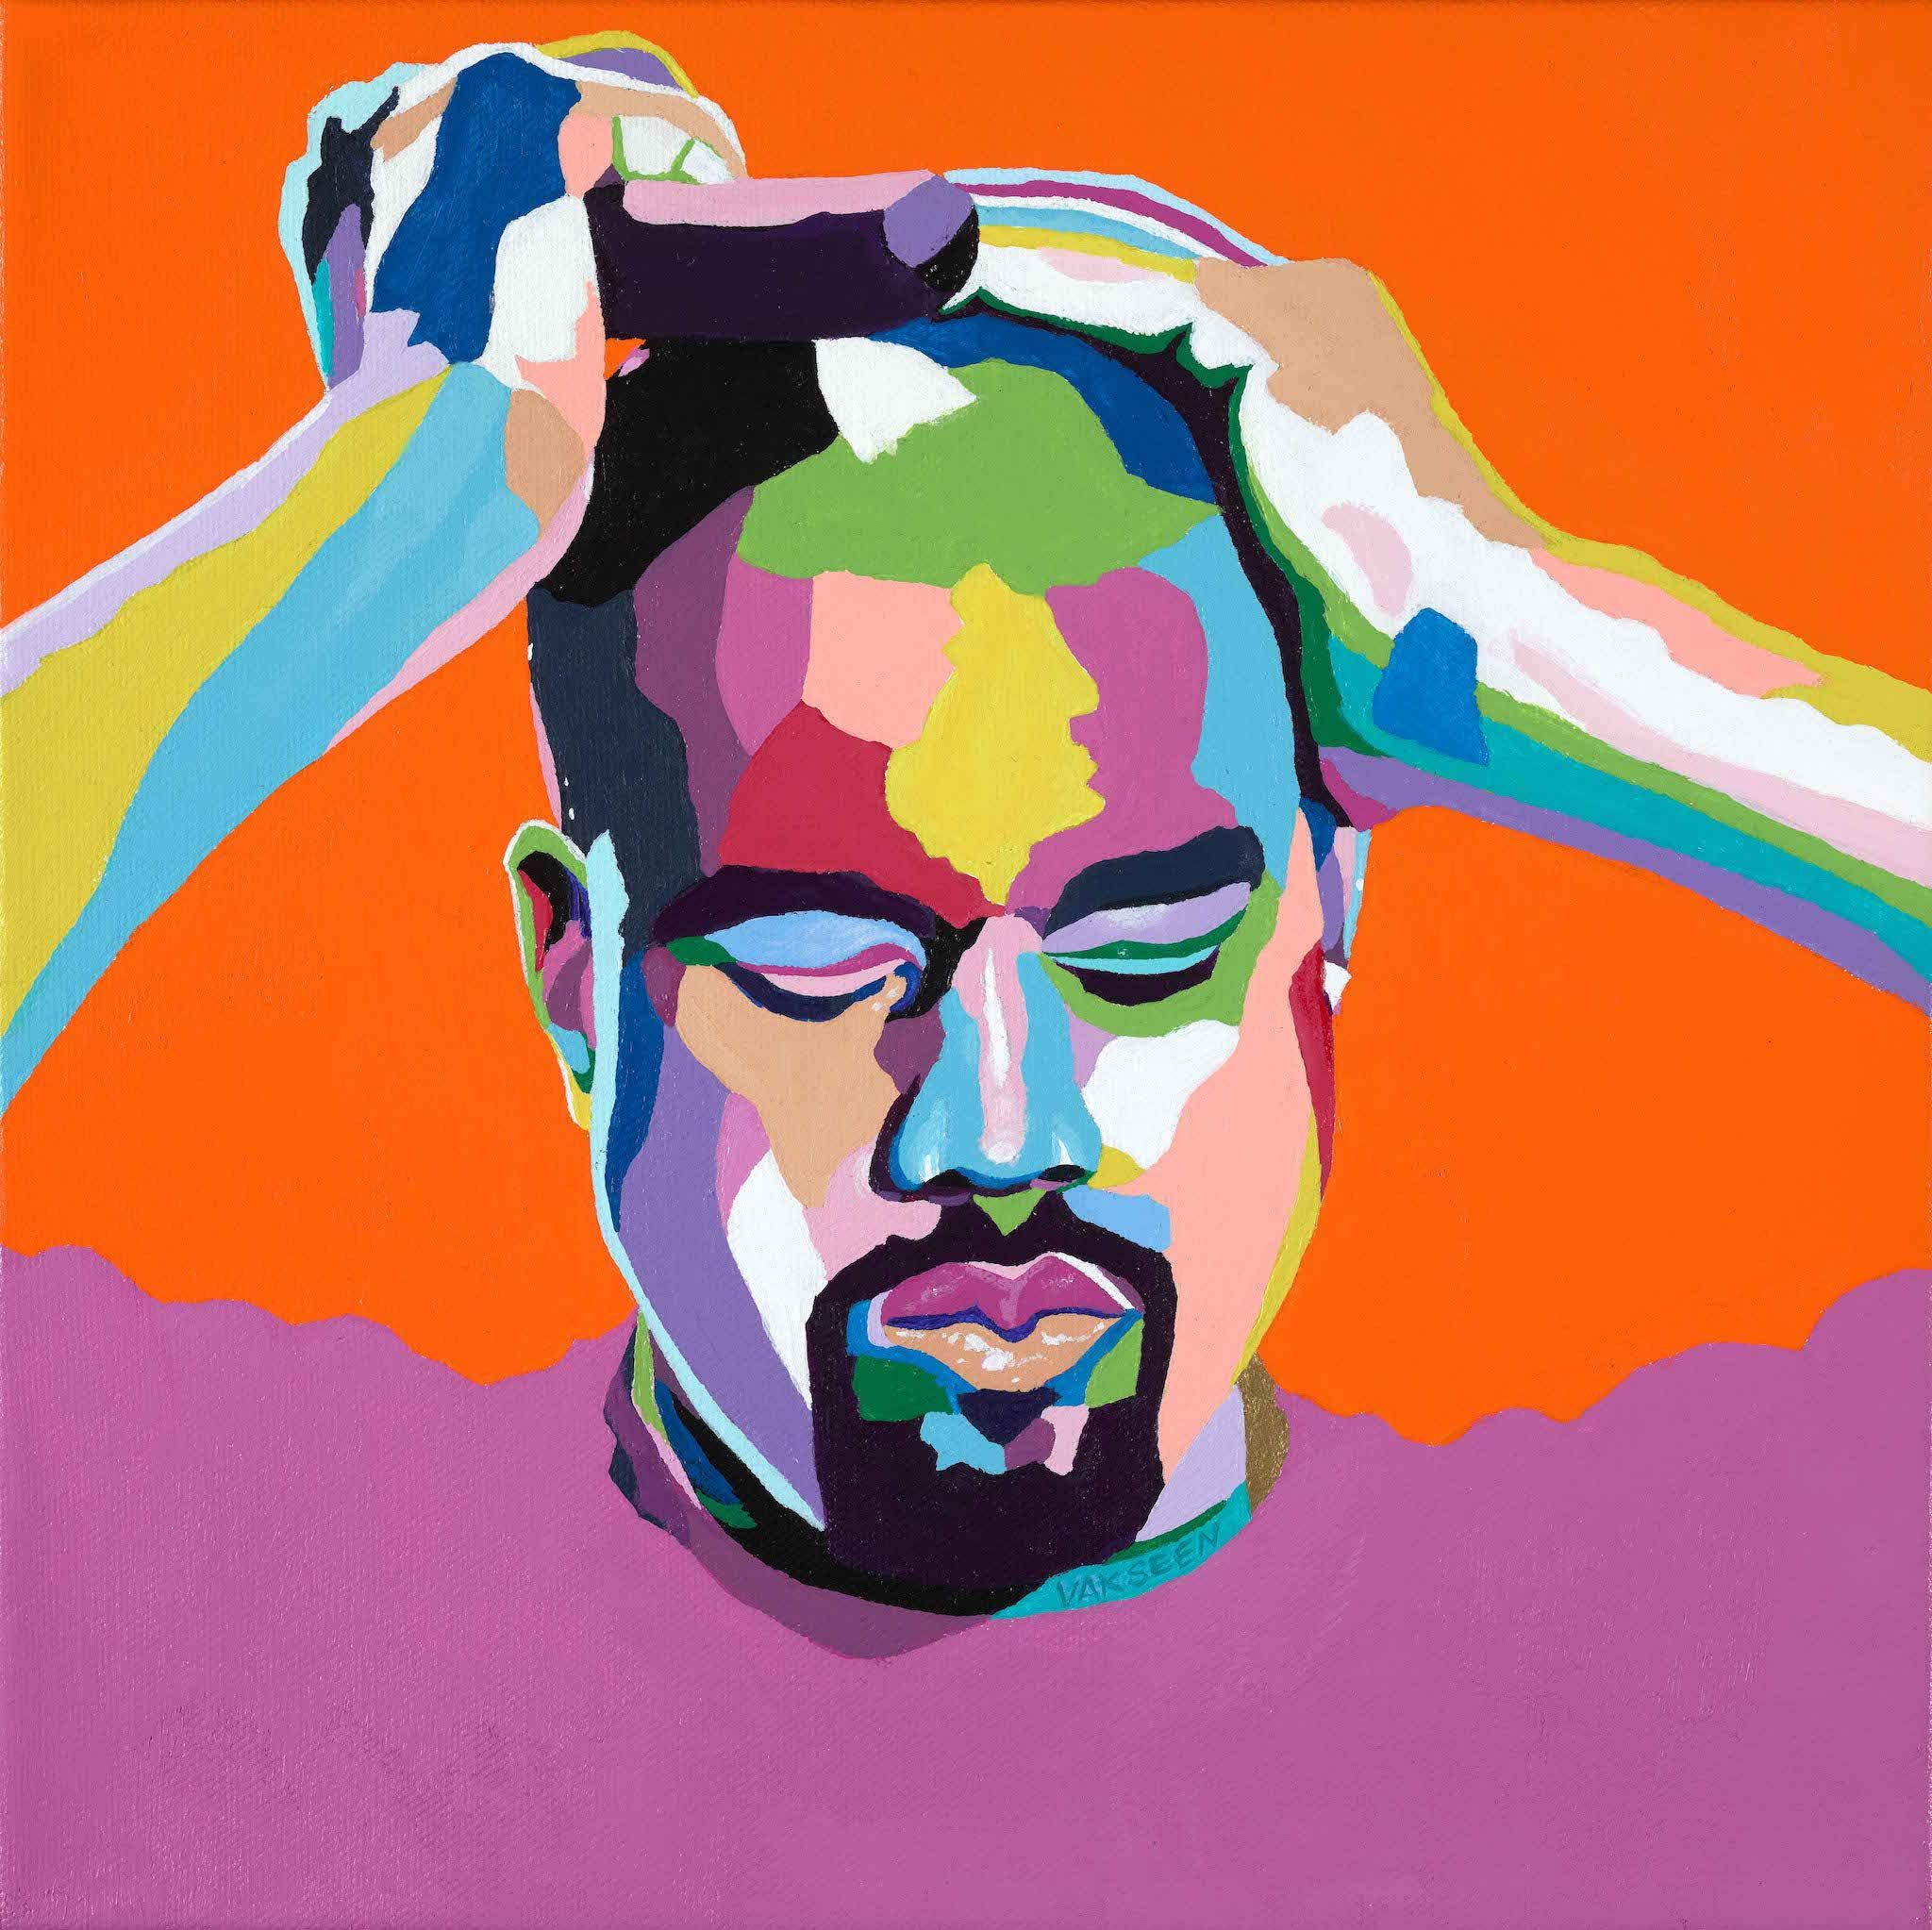 Vakseen Art Mood Kanye Kanye West Portrait Art Limited Edition Yeezy Stickers For Wall Decor Laptops Skateboards Etc Hip Hop Art Kanye West Portrait Art